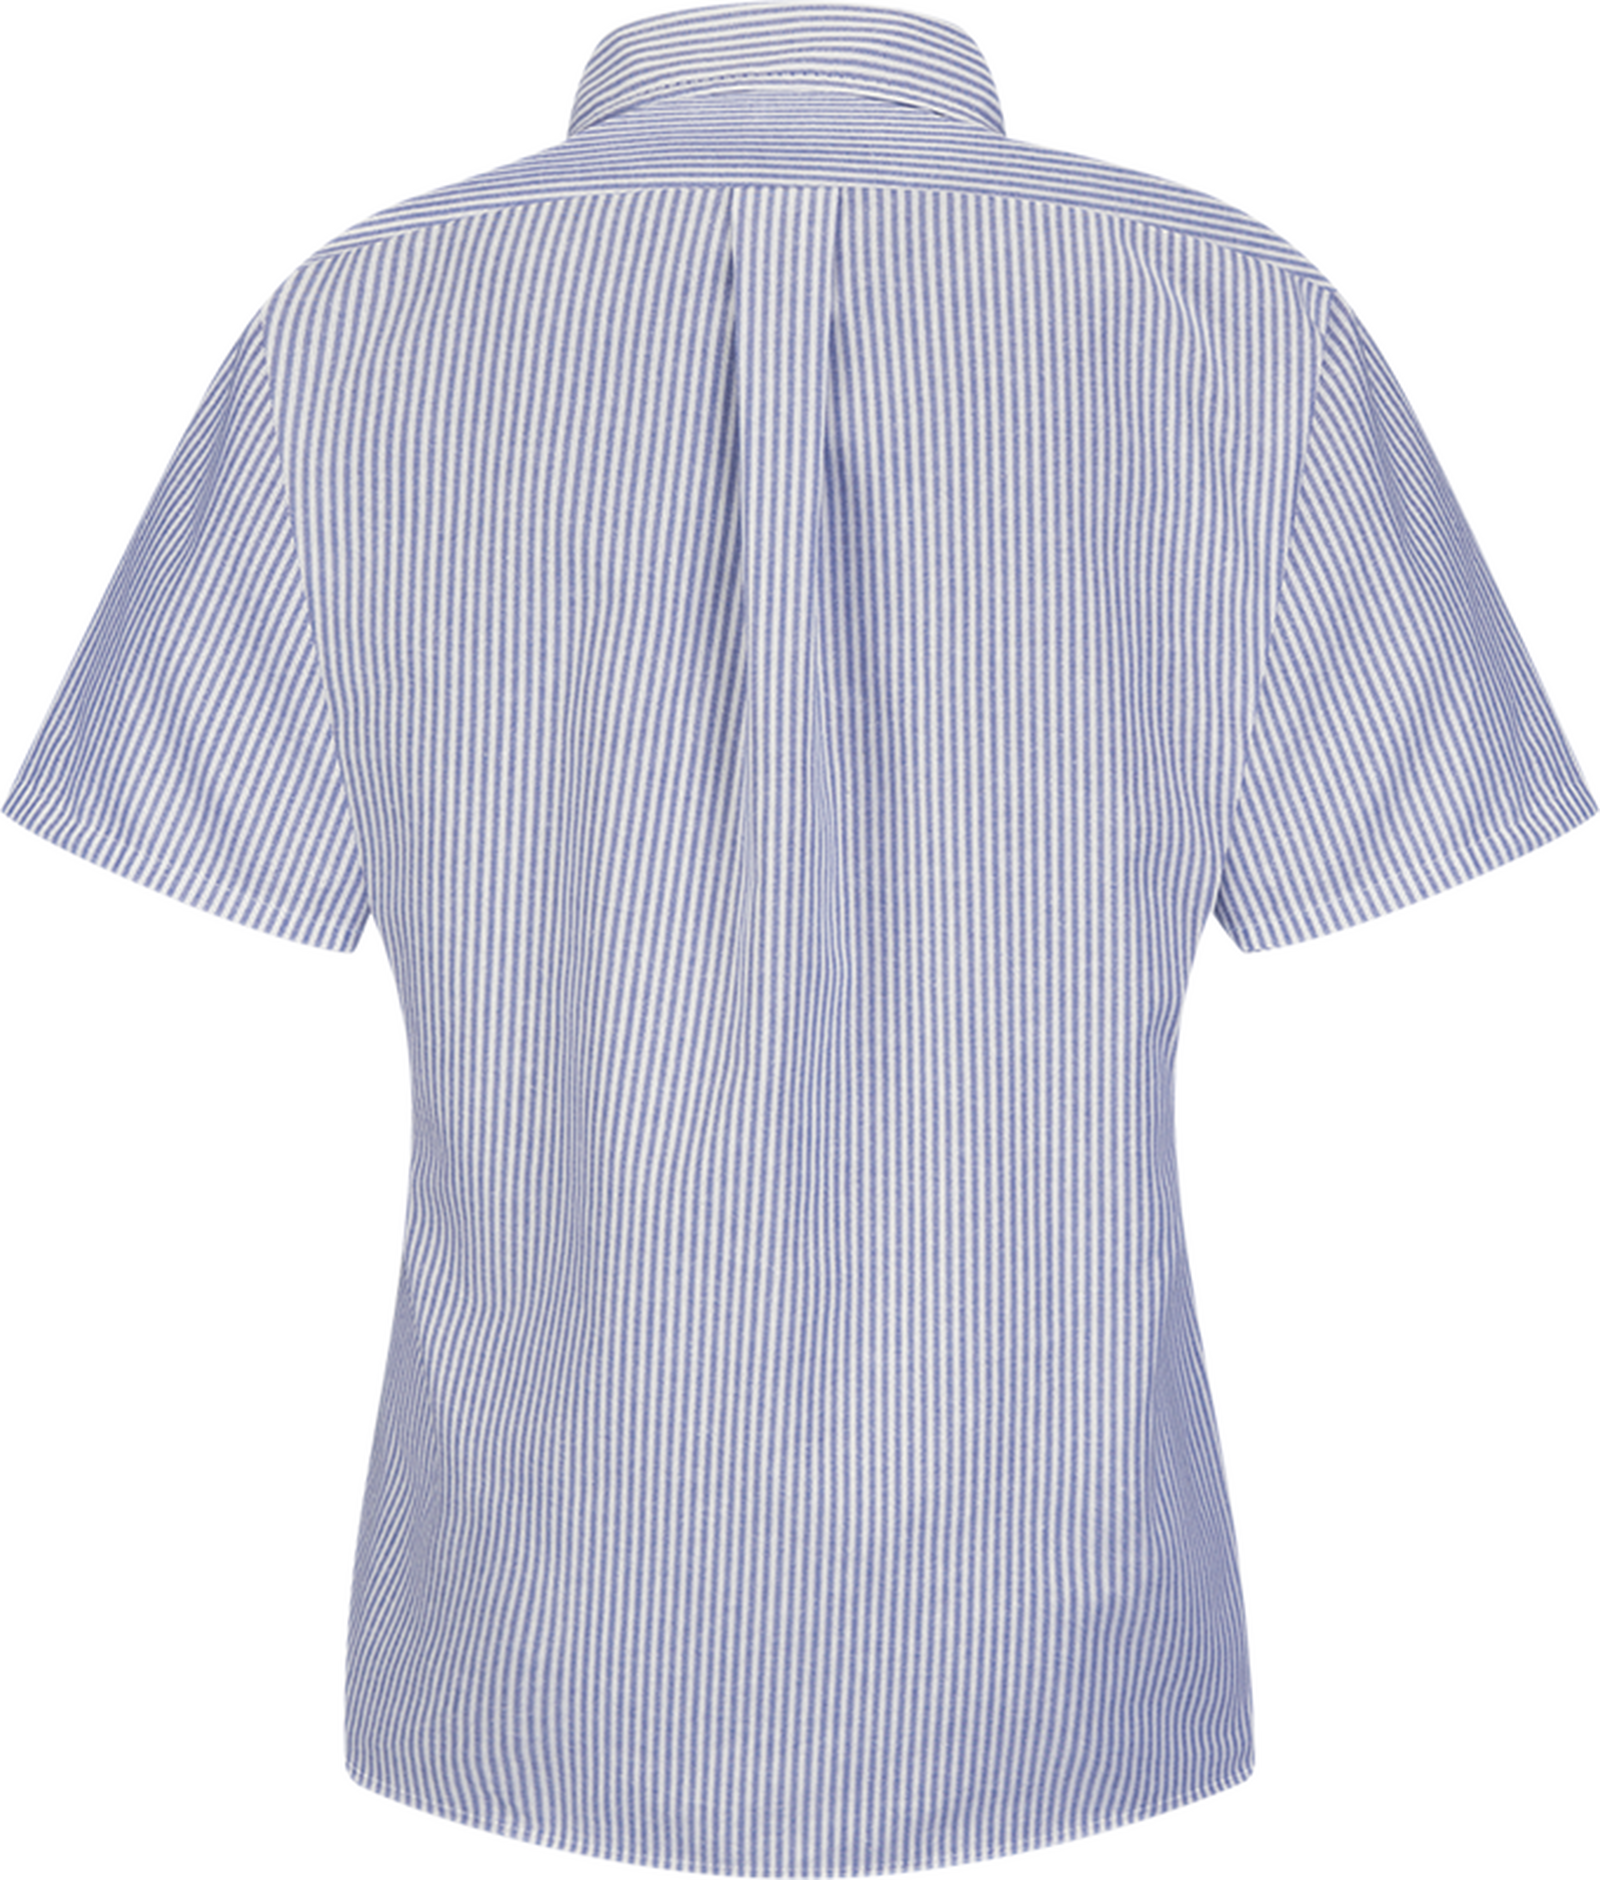 Women's Short Sleeve Executive Oxford Dress Shirt